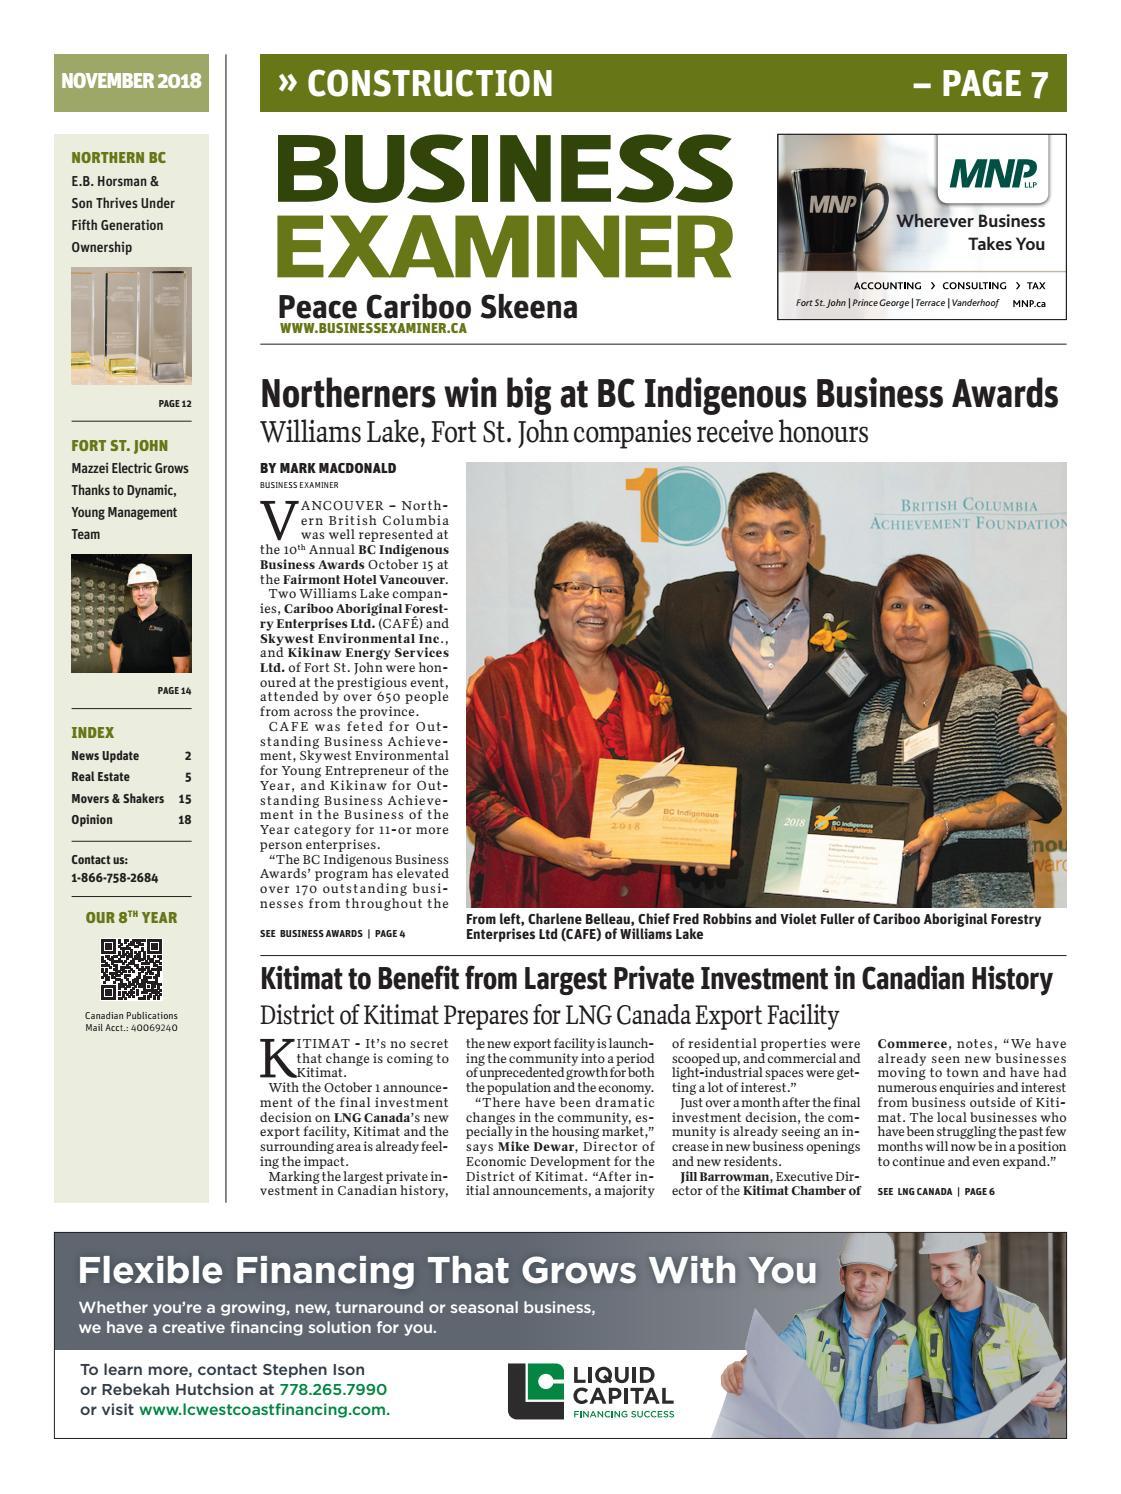 Business Examiner Peace Cariboo - November 2018 by Business Examiner